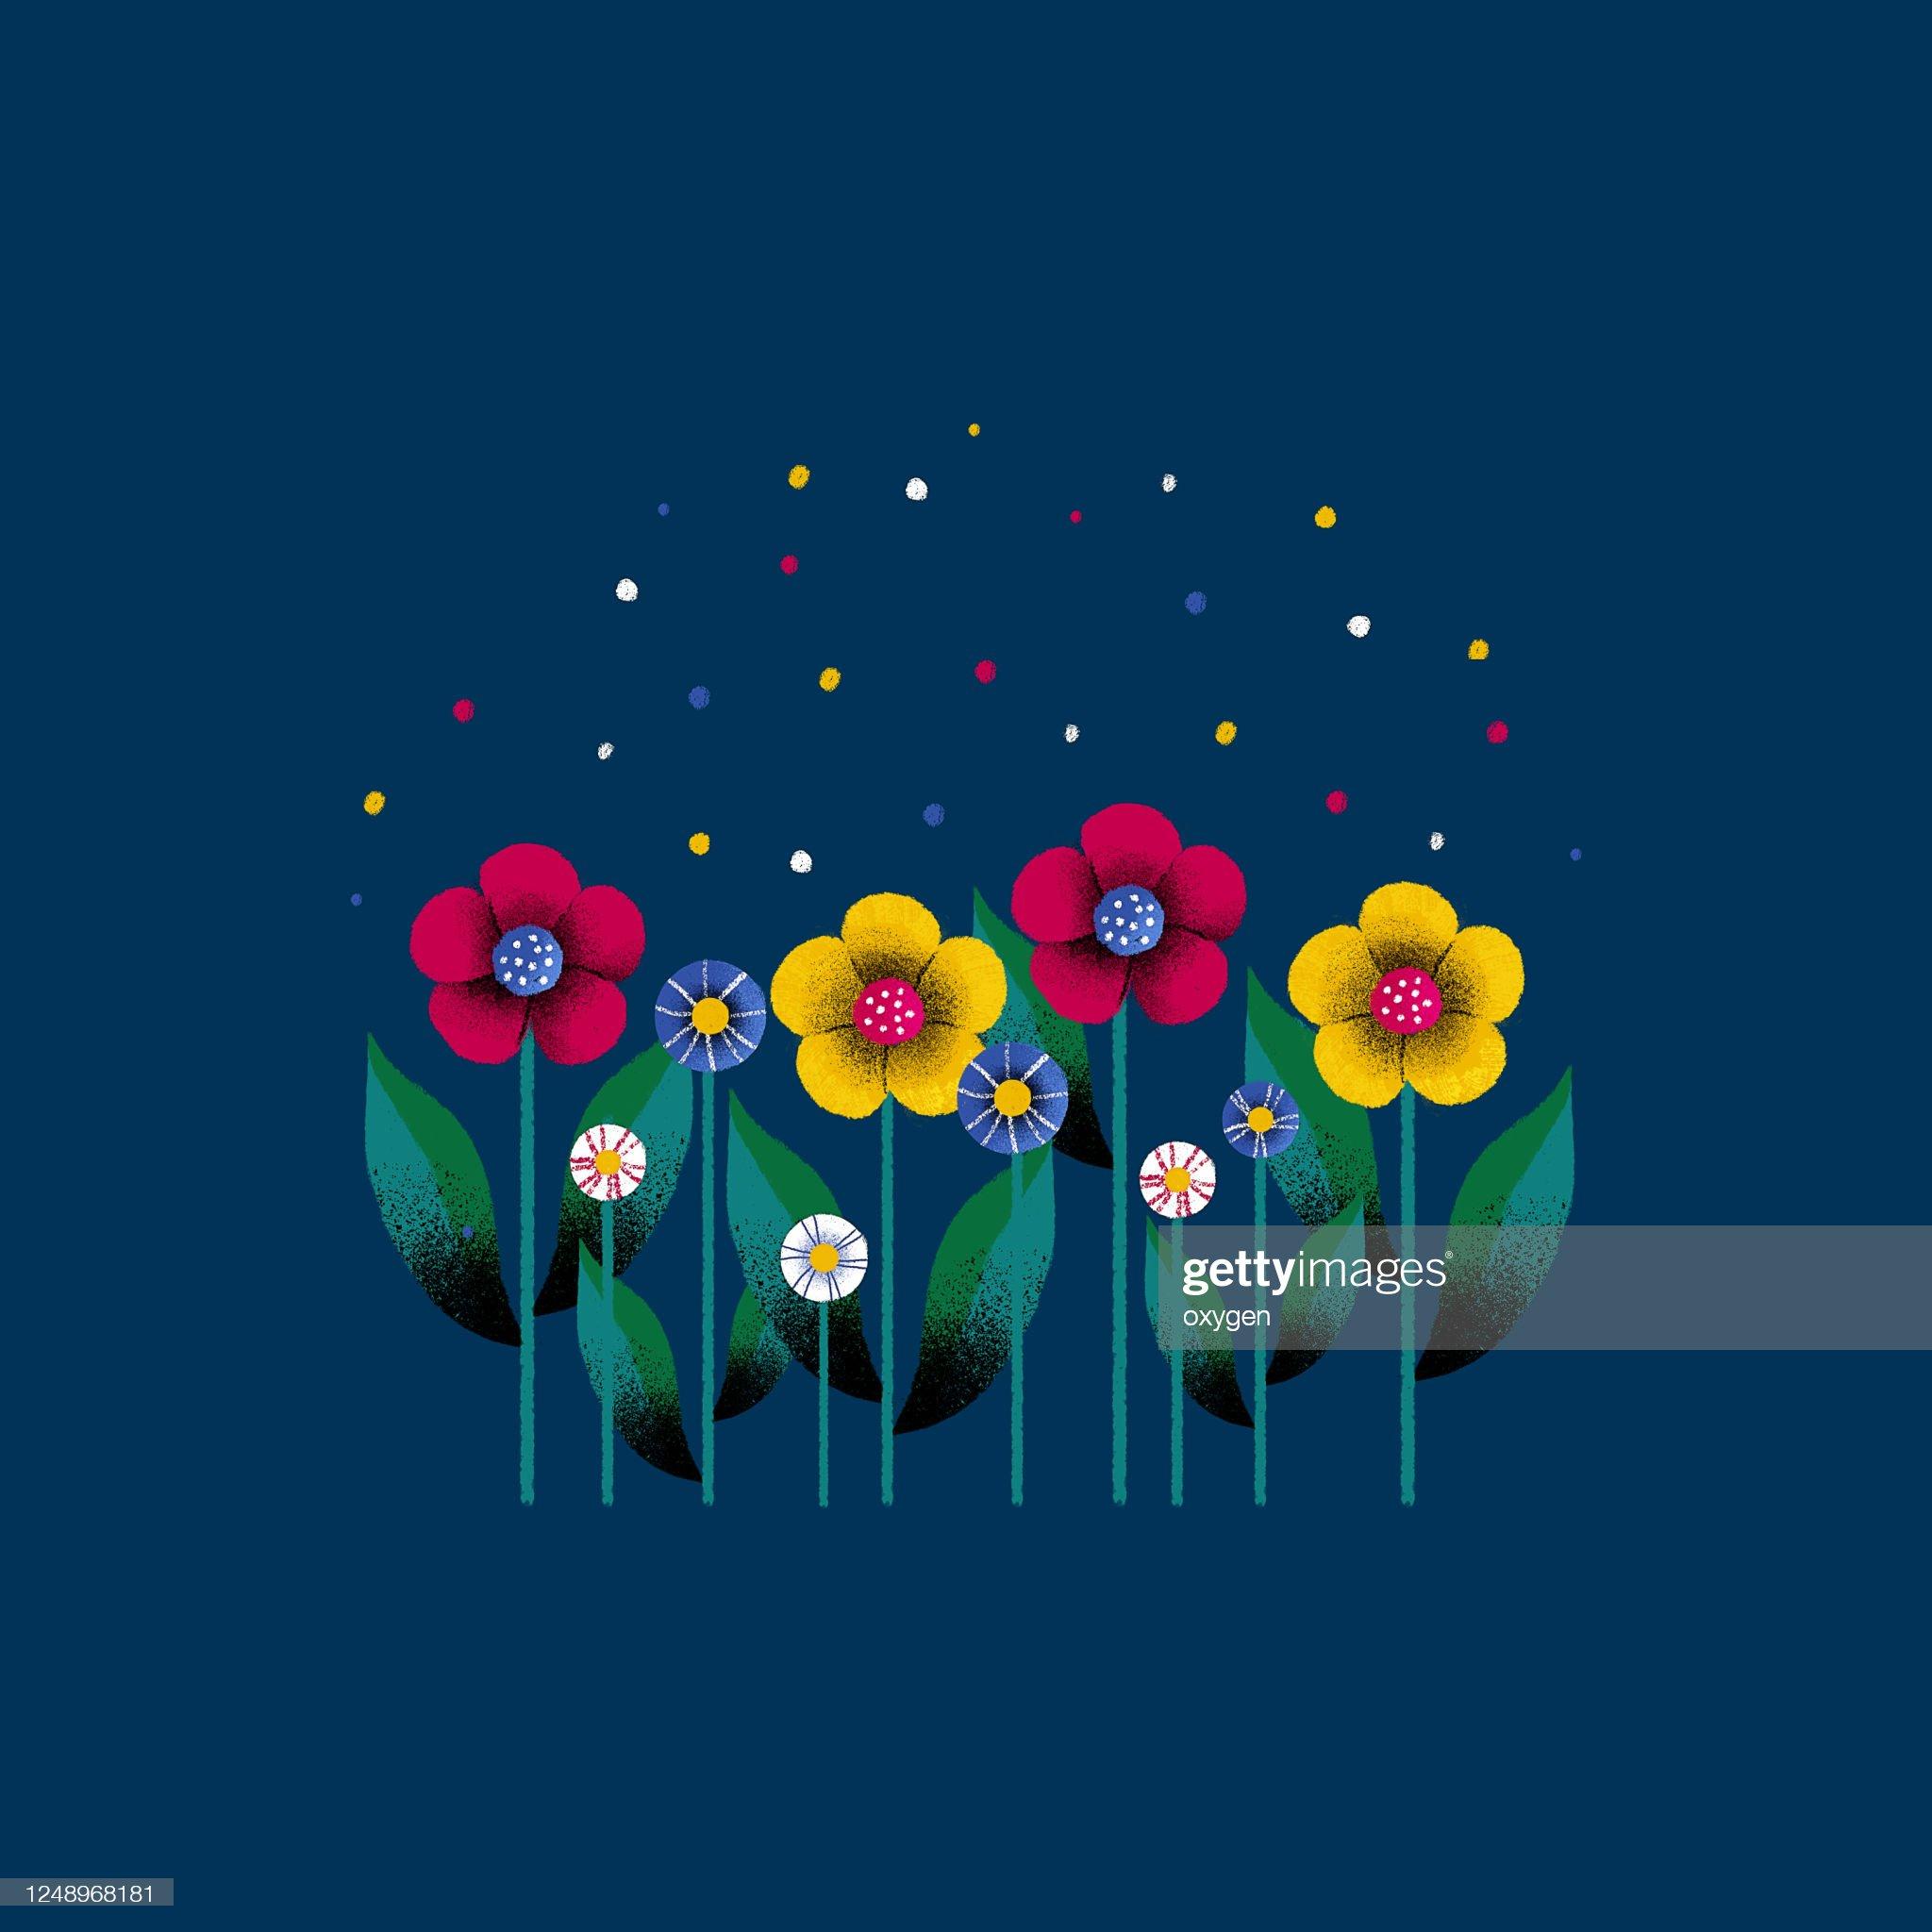 Row of Spring Colorful Bouquet Flowers. Flat Design on Dark Blue Background. Digital Illustration : 圖庫照片